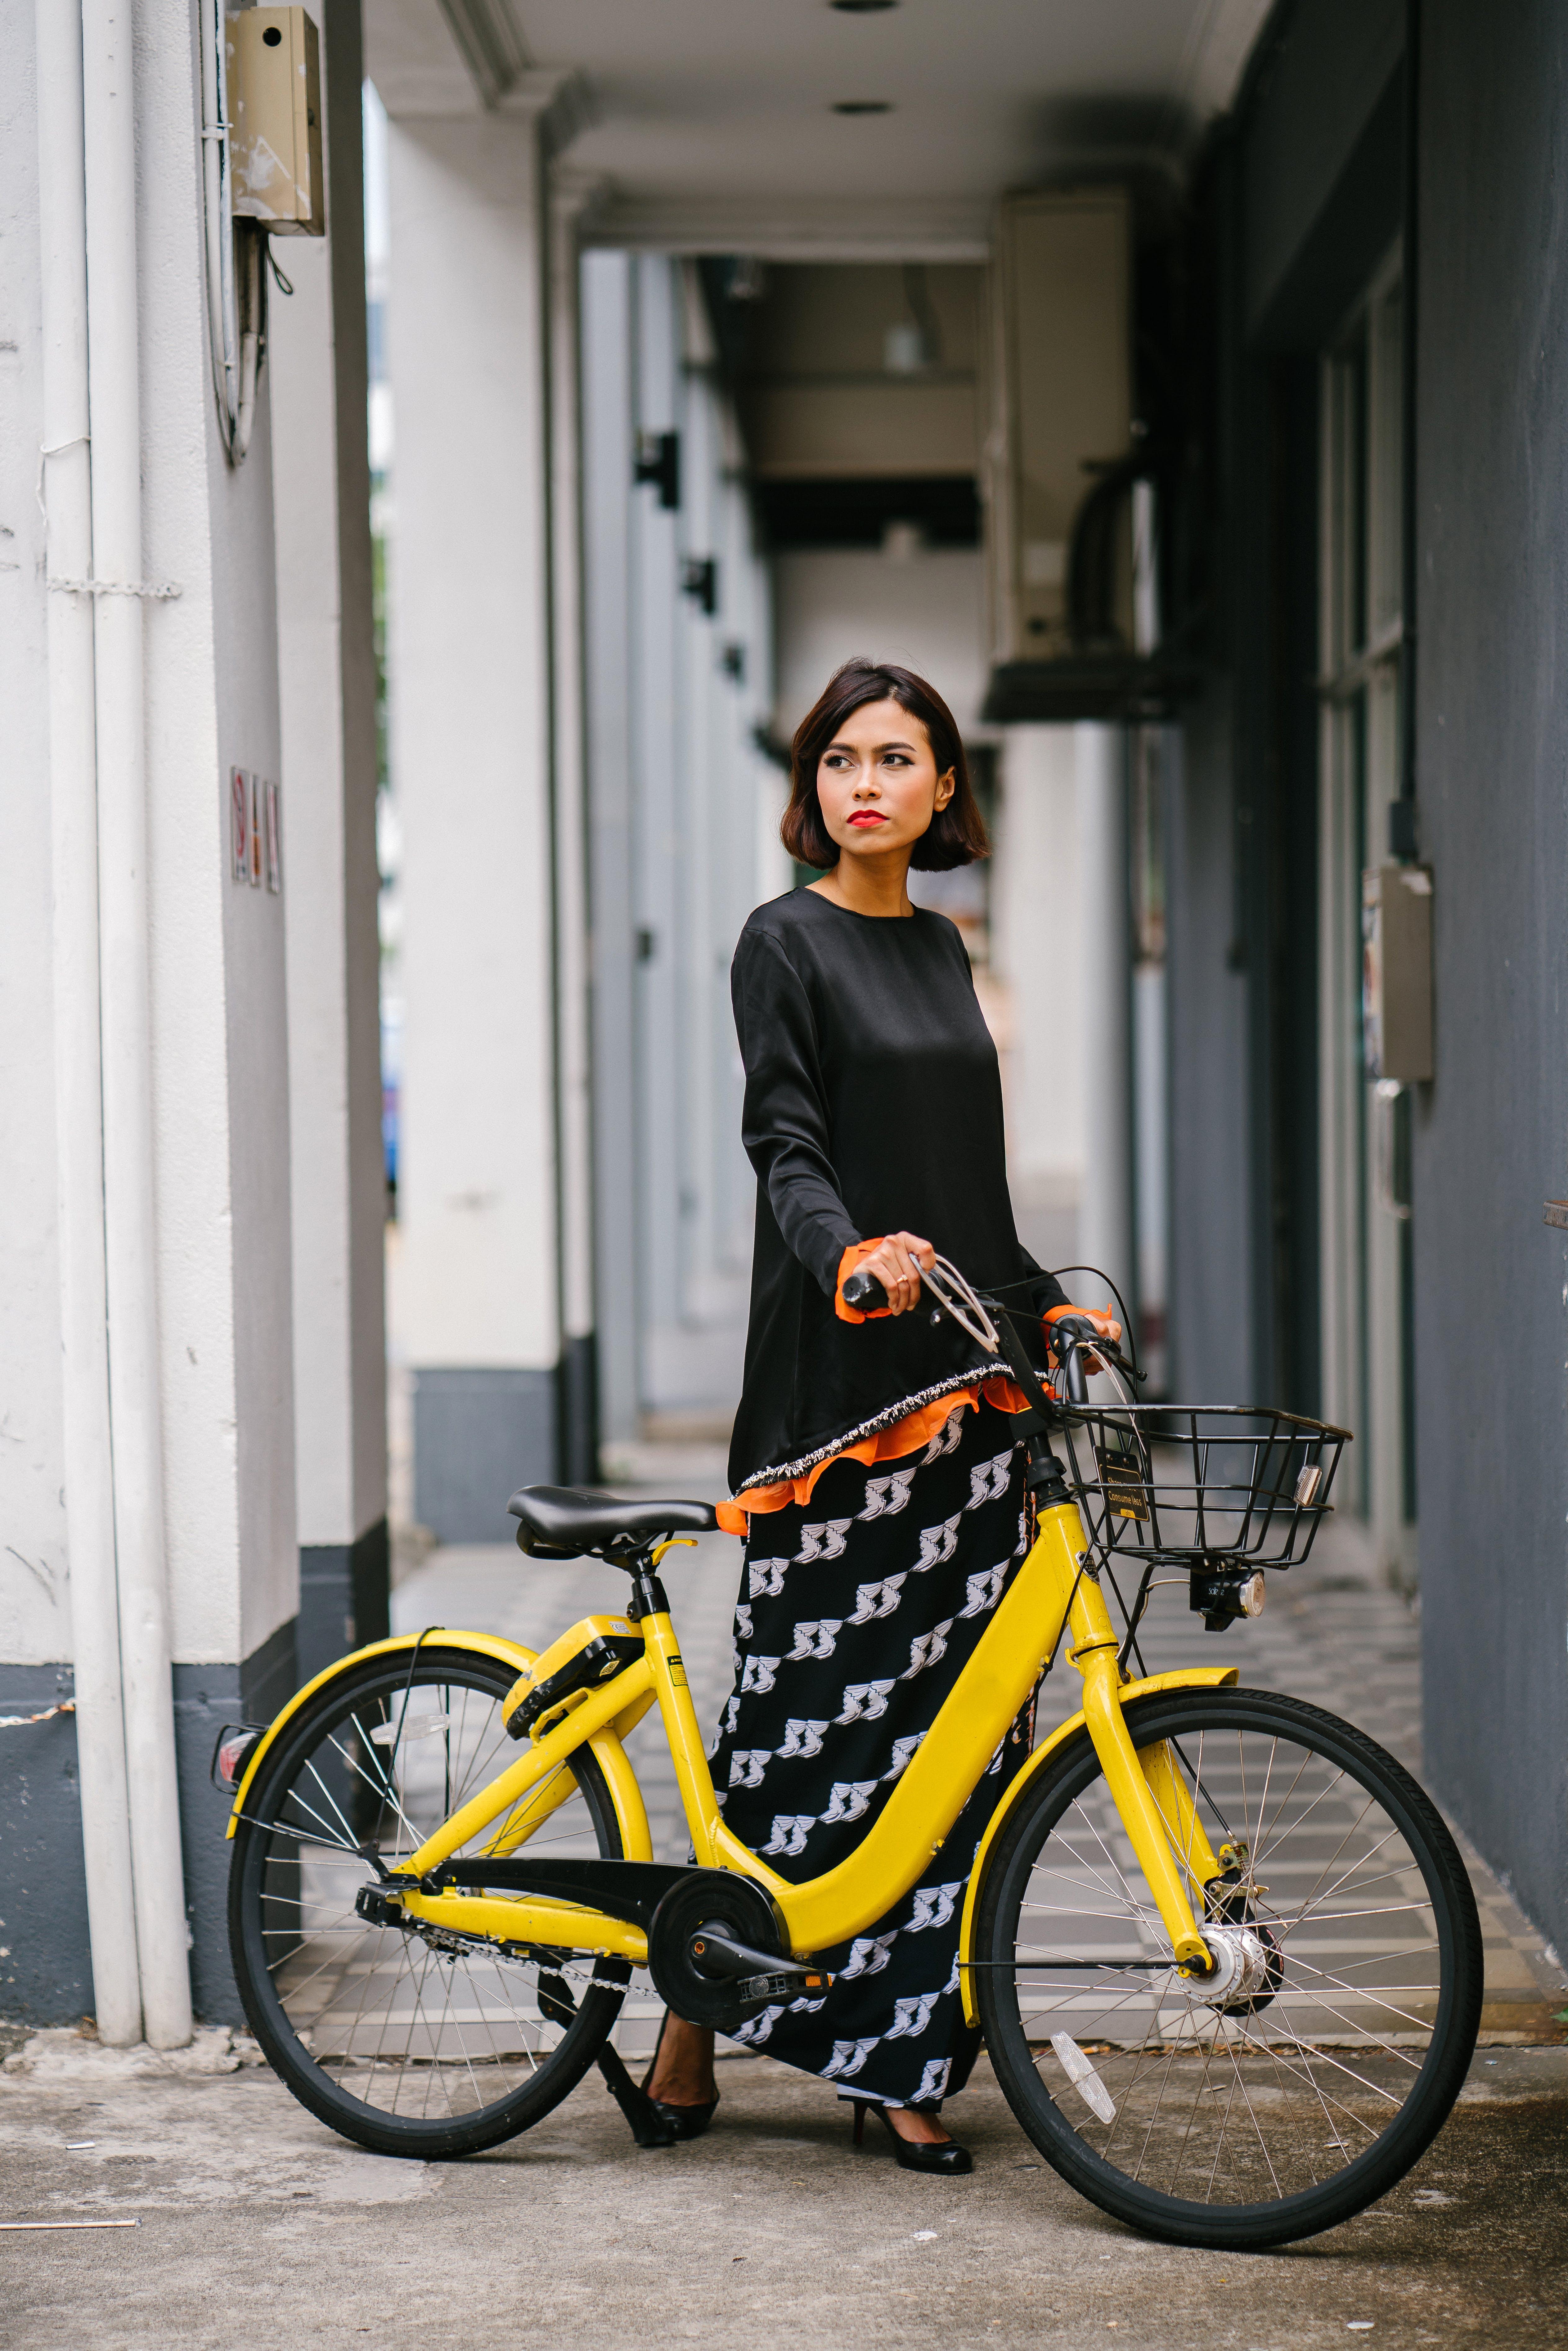 Woman Holding Yellow Bike at Daytime